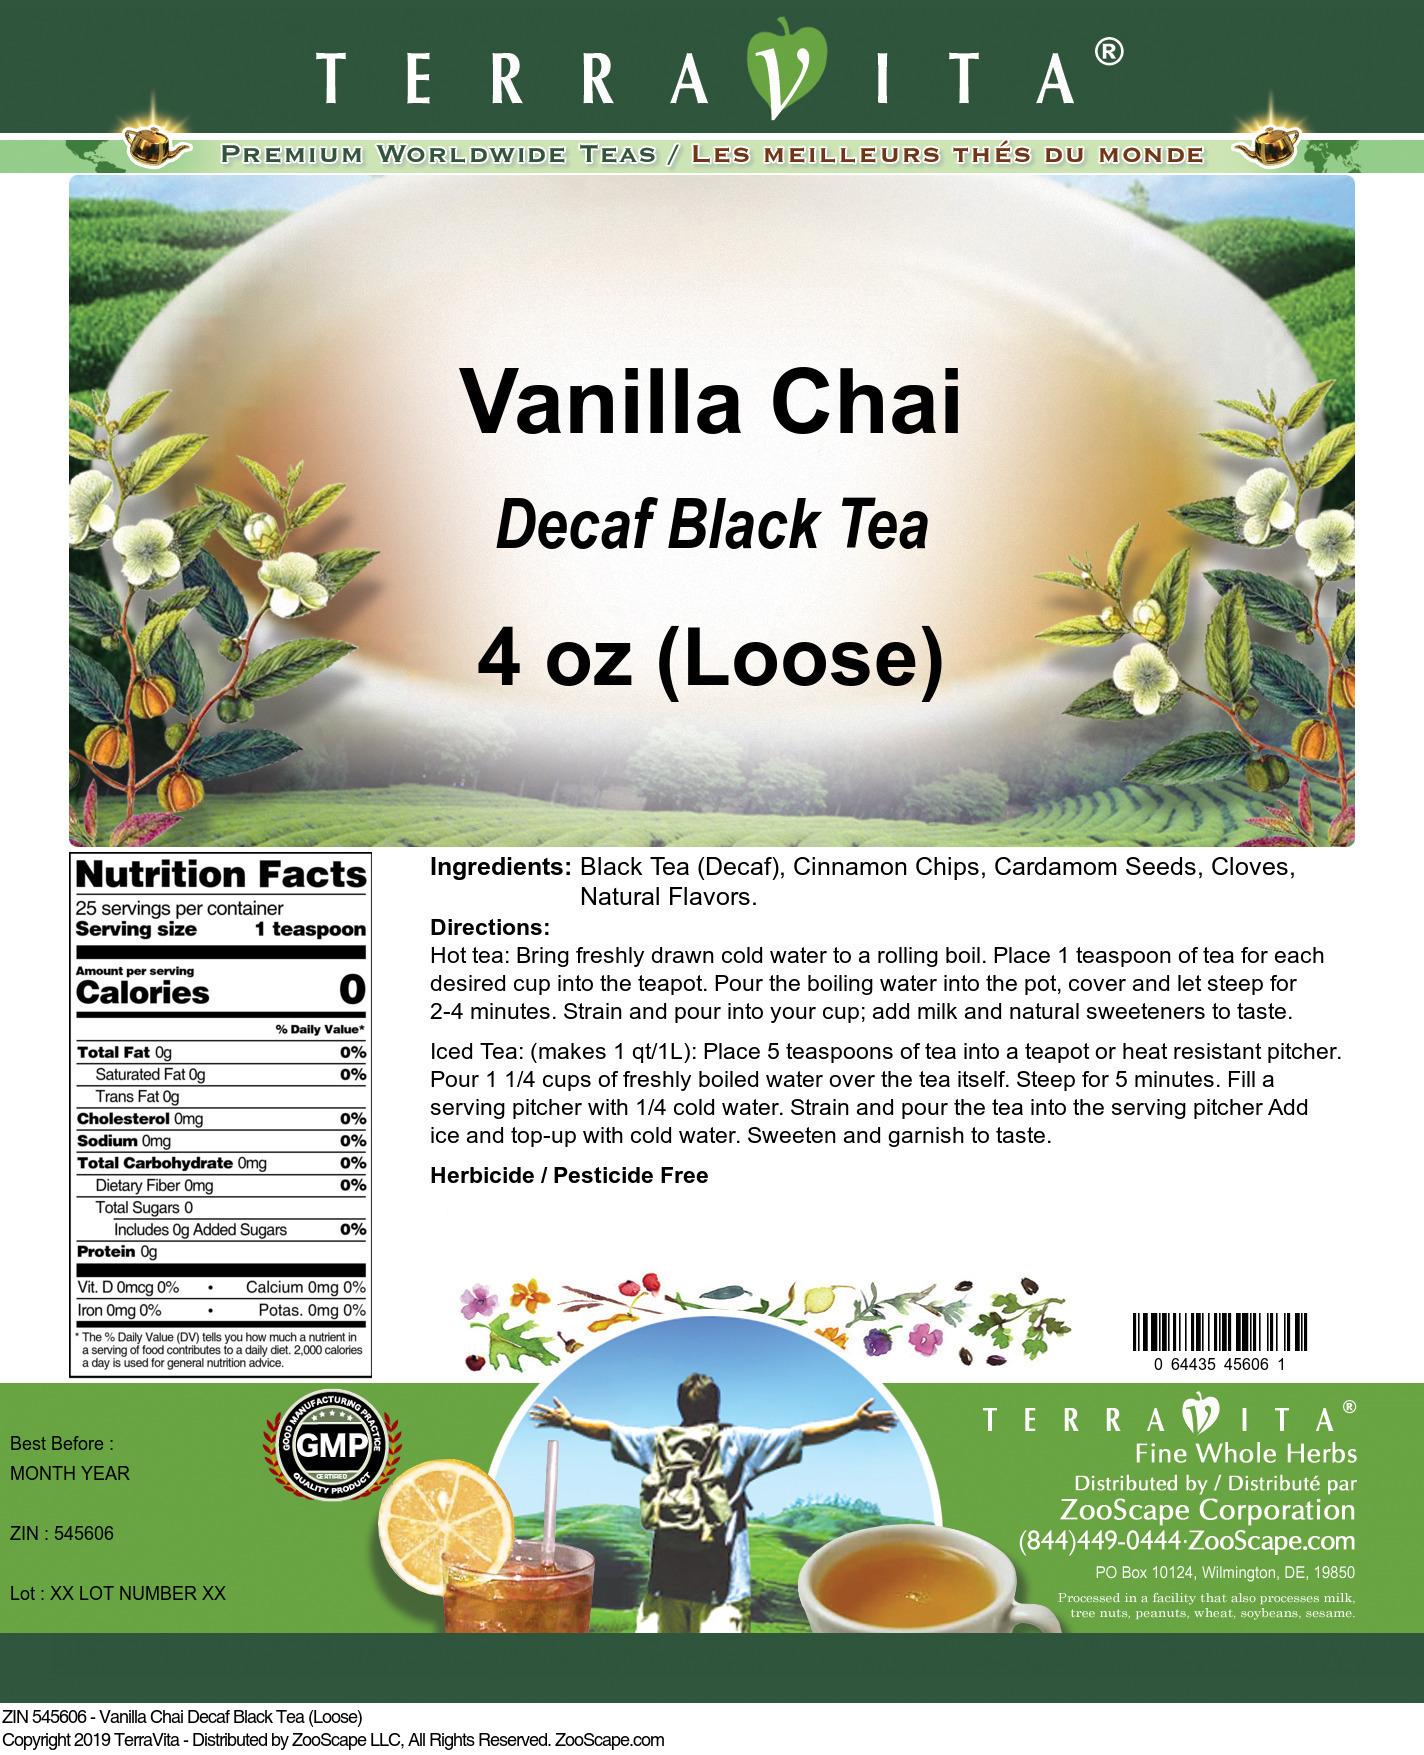 Vanilla Chai Decaf Black Tea